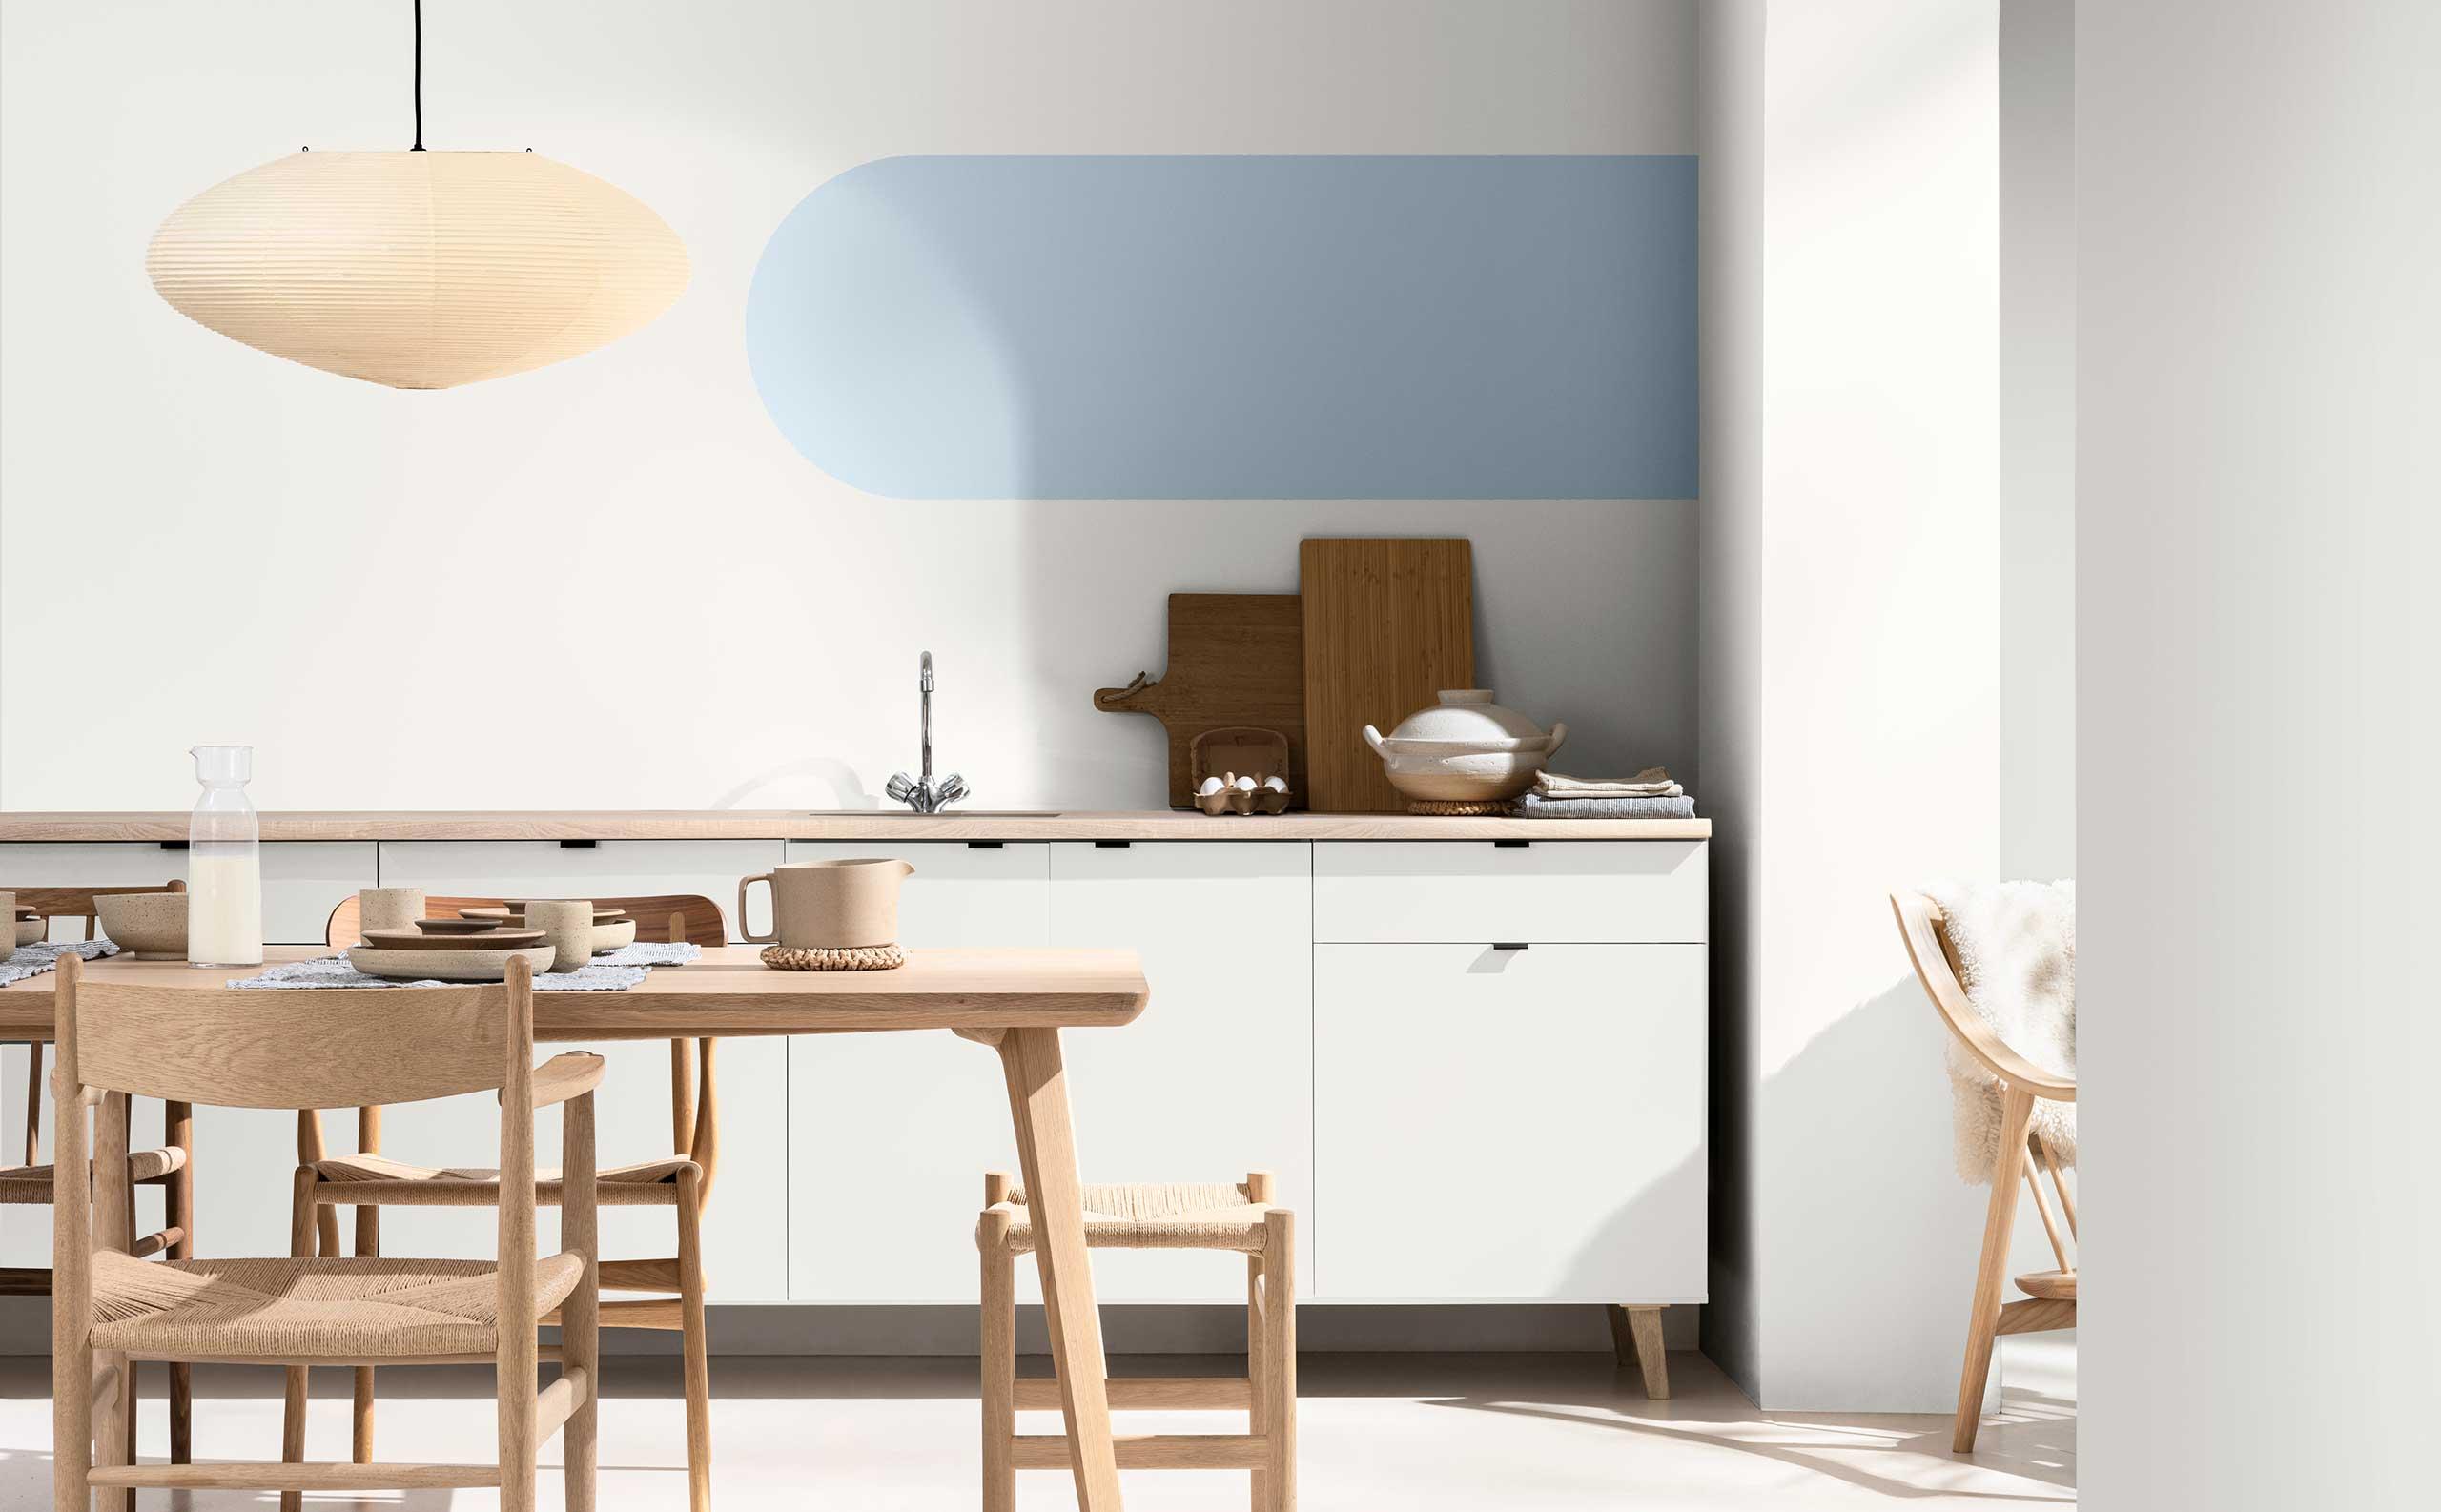 Dulux-Colour-Futures-Colour-of-the-Year-2022-The-Salon-Colours-Kitchen-Inspiration-Global-34